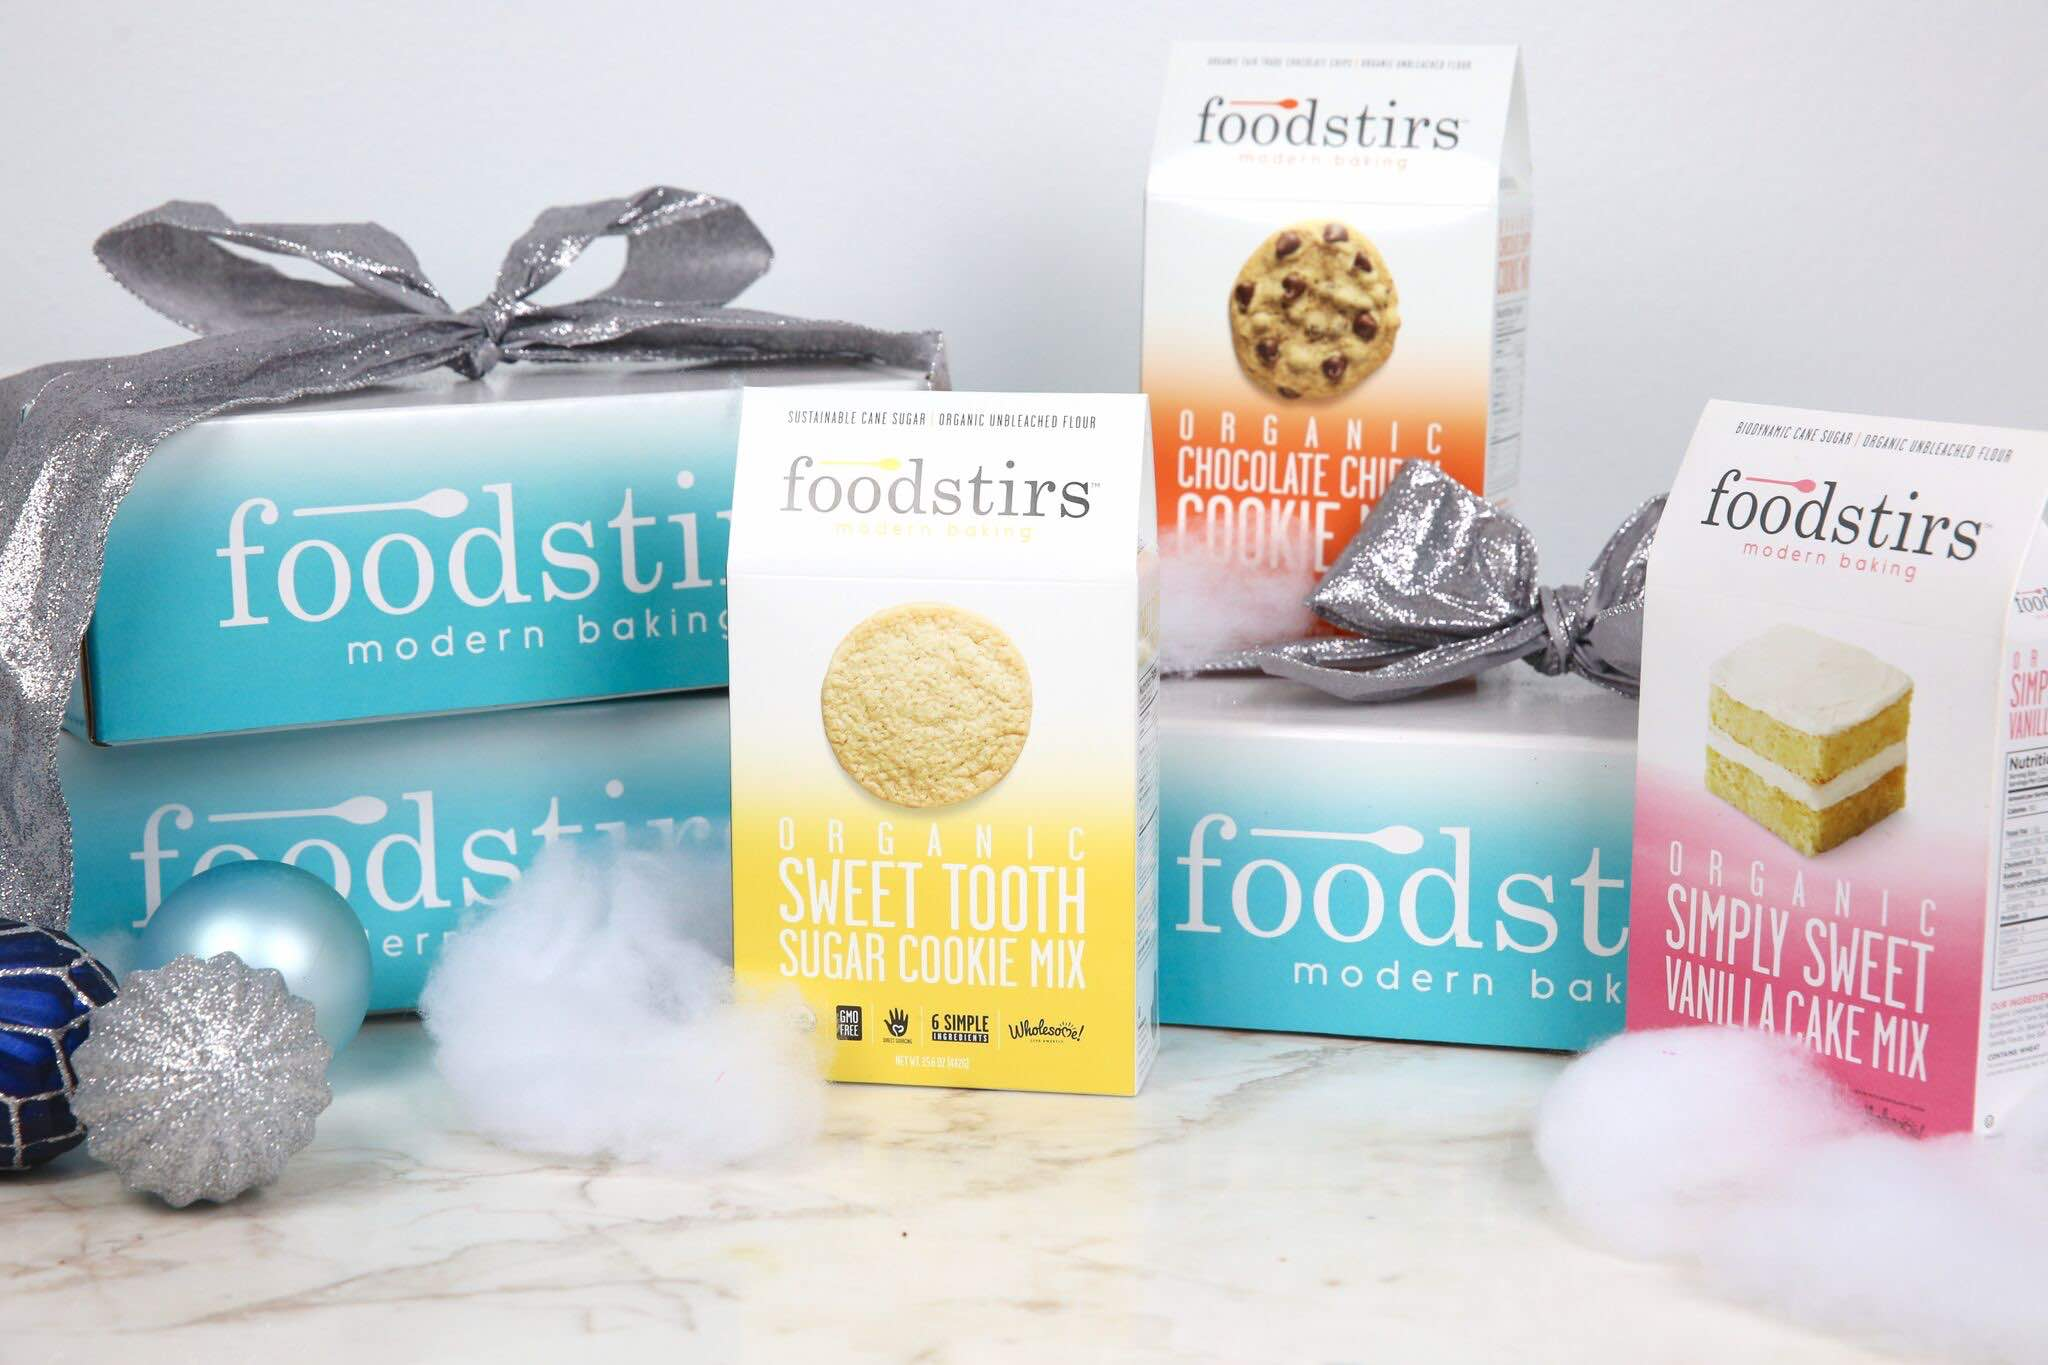 foodstirs quick scratch baking mixes